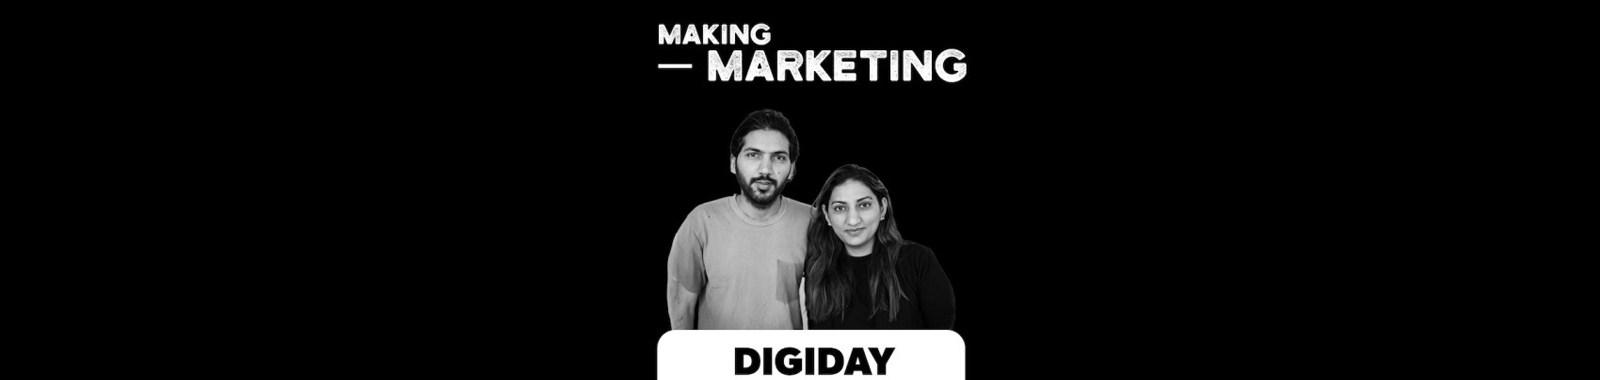 making_marketing_2596x1078_Waqas-Sidra-eye